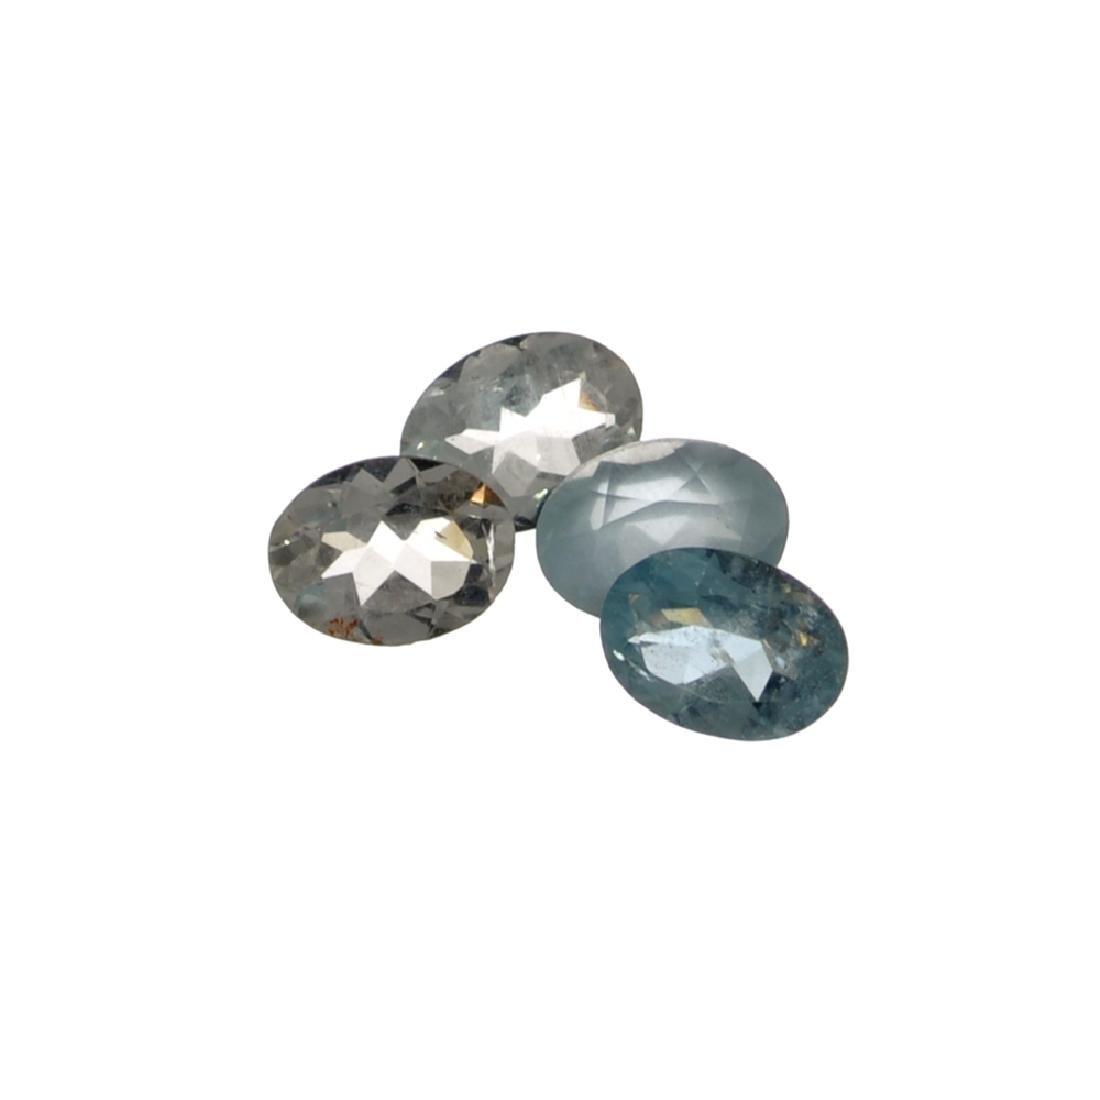 APP: 1.2k 4.12CT Oval Cut Aquamarine Parcel